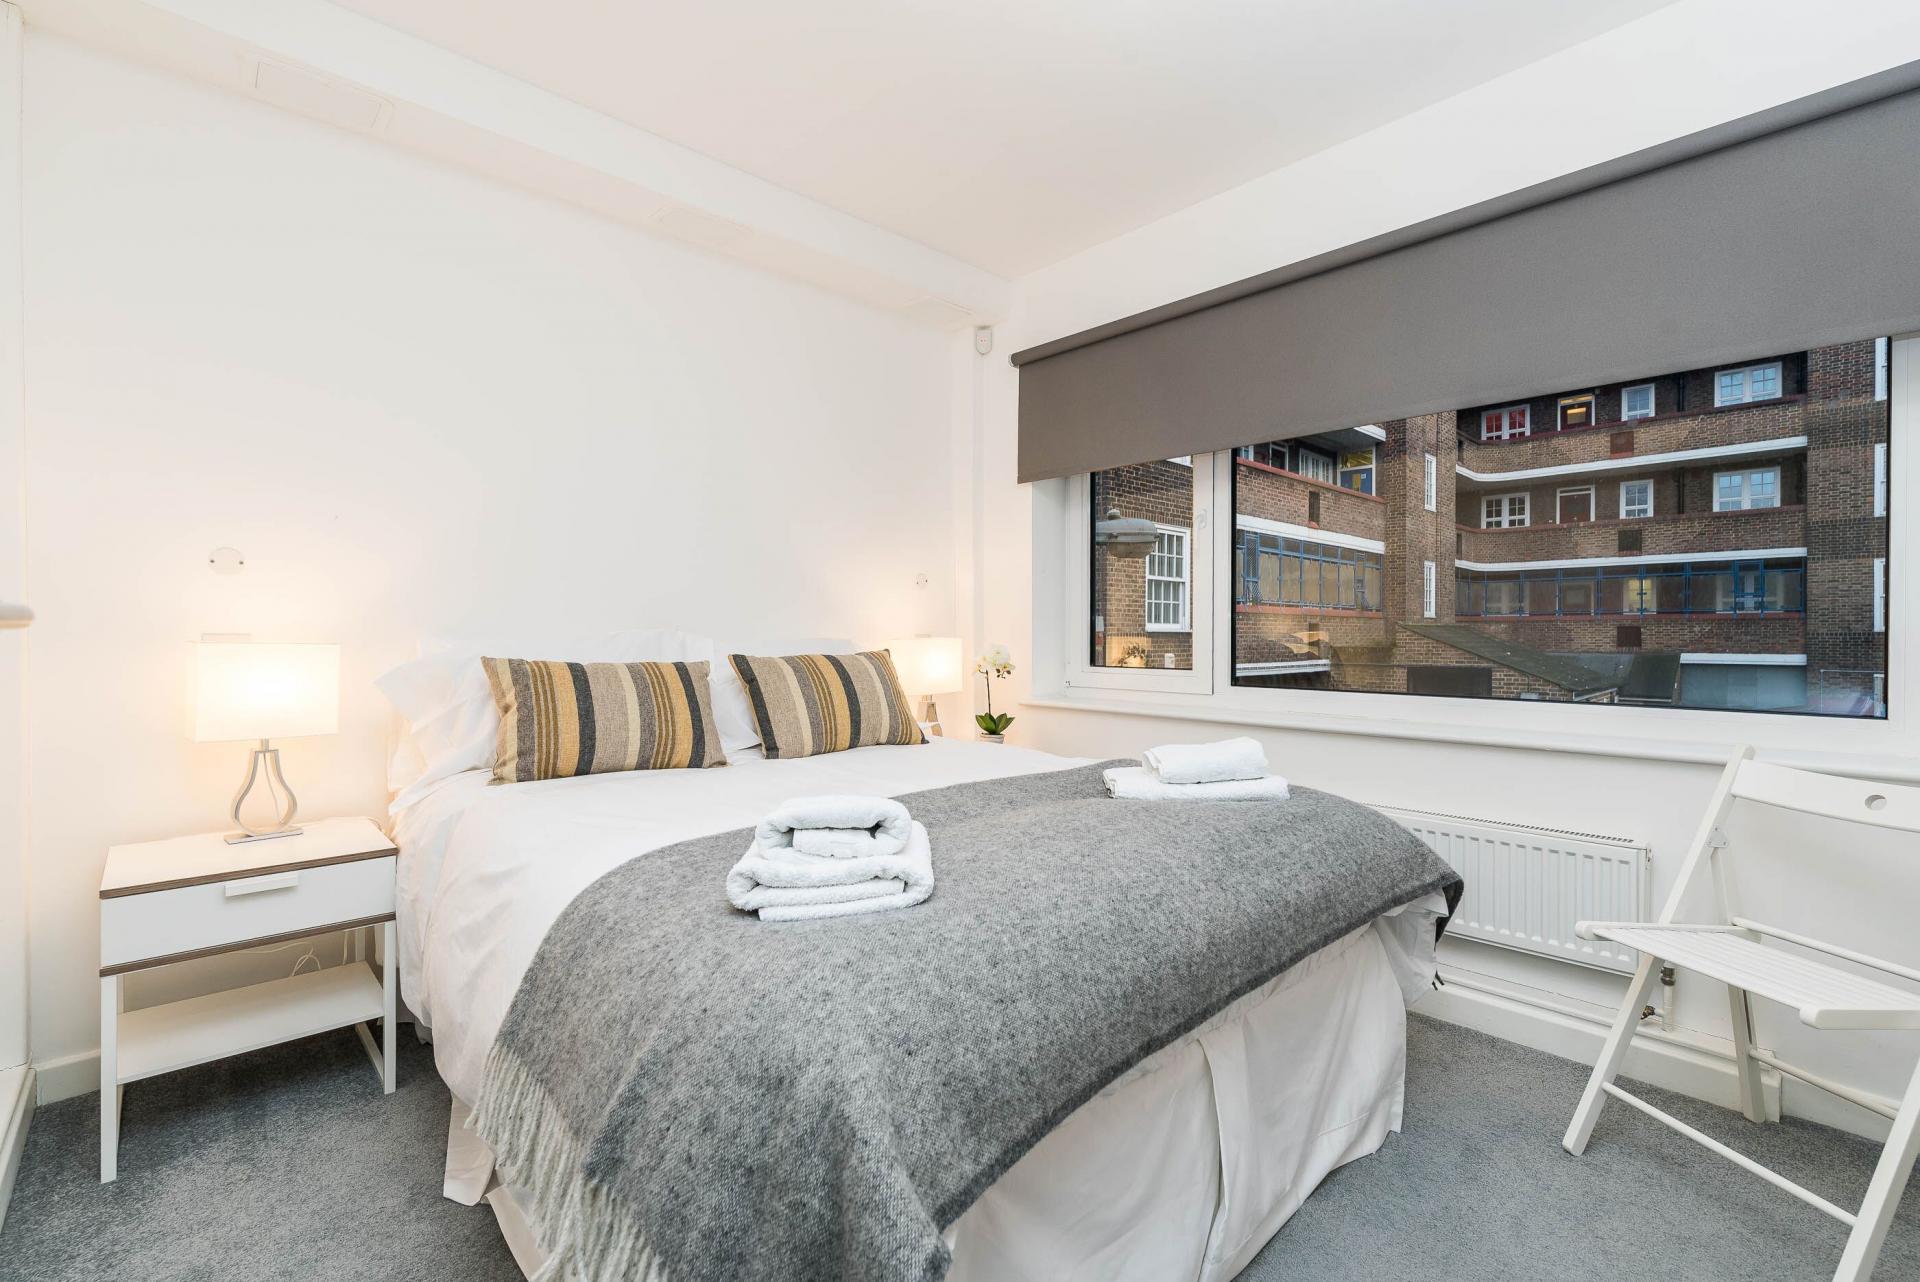 Bedroom at Vibrant Vauxhall Apartments